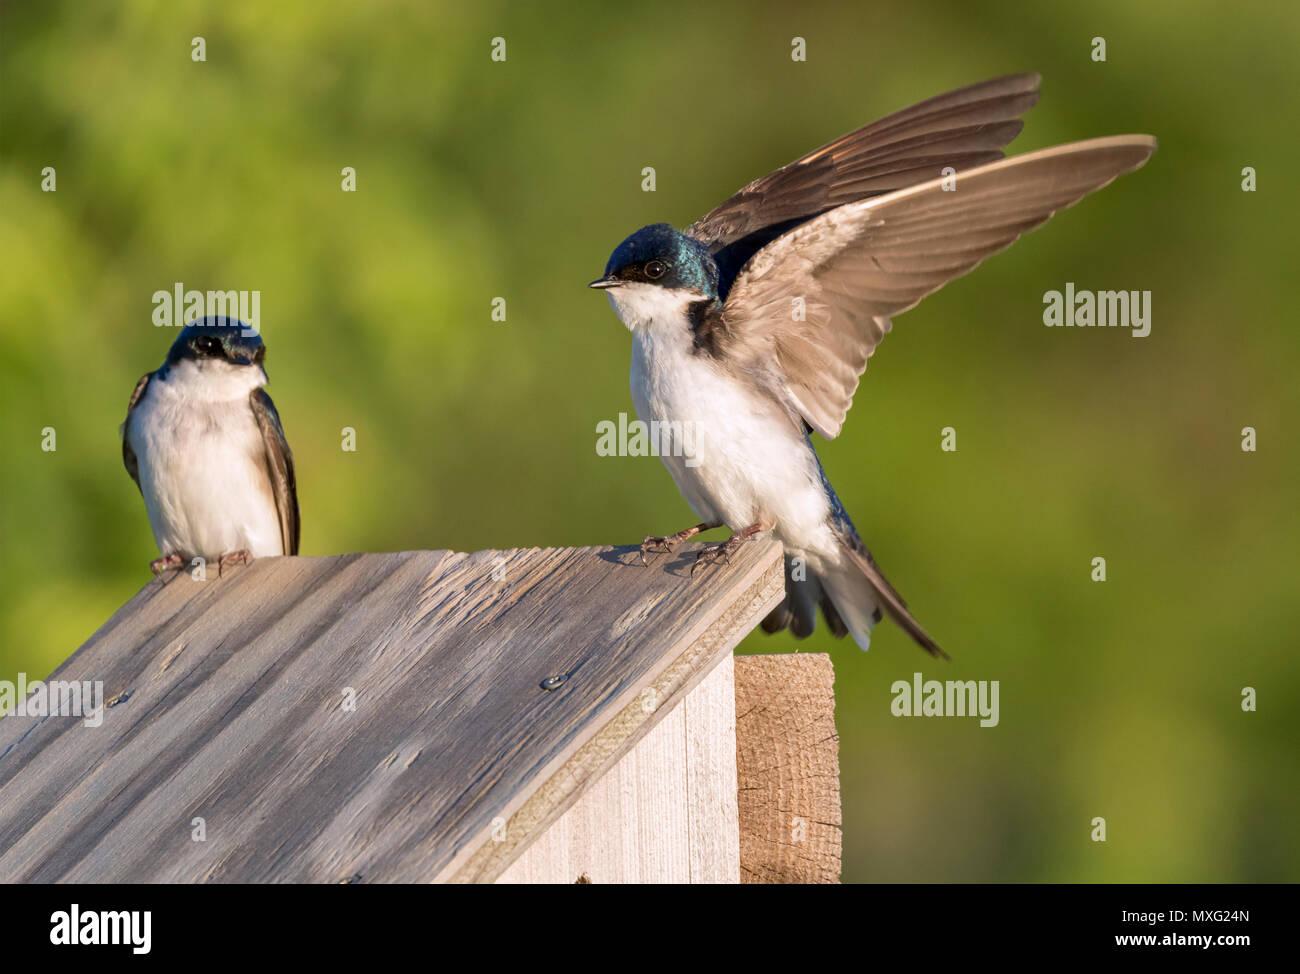 Tree swallow (Tachycineta bicolor) near bird house, Iowa, USA Stock Photo